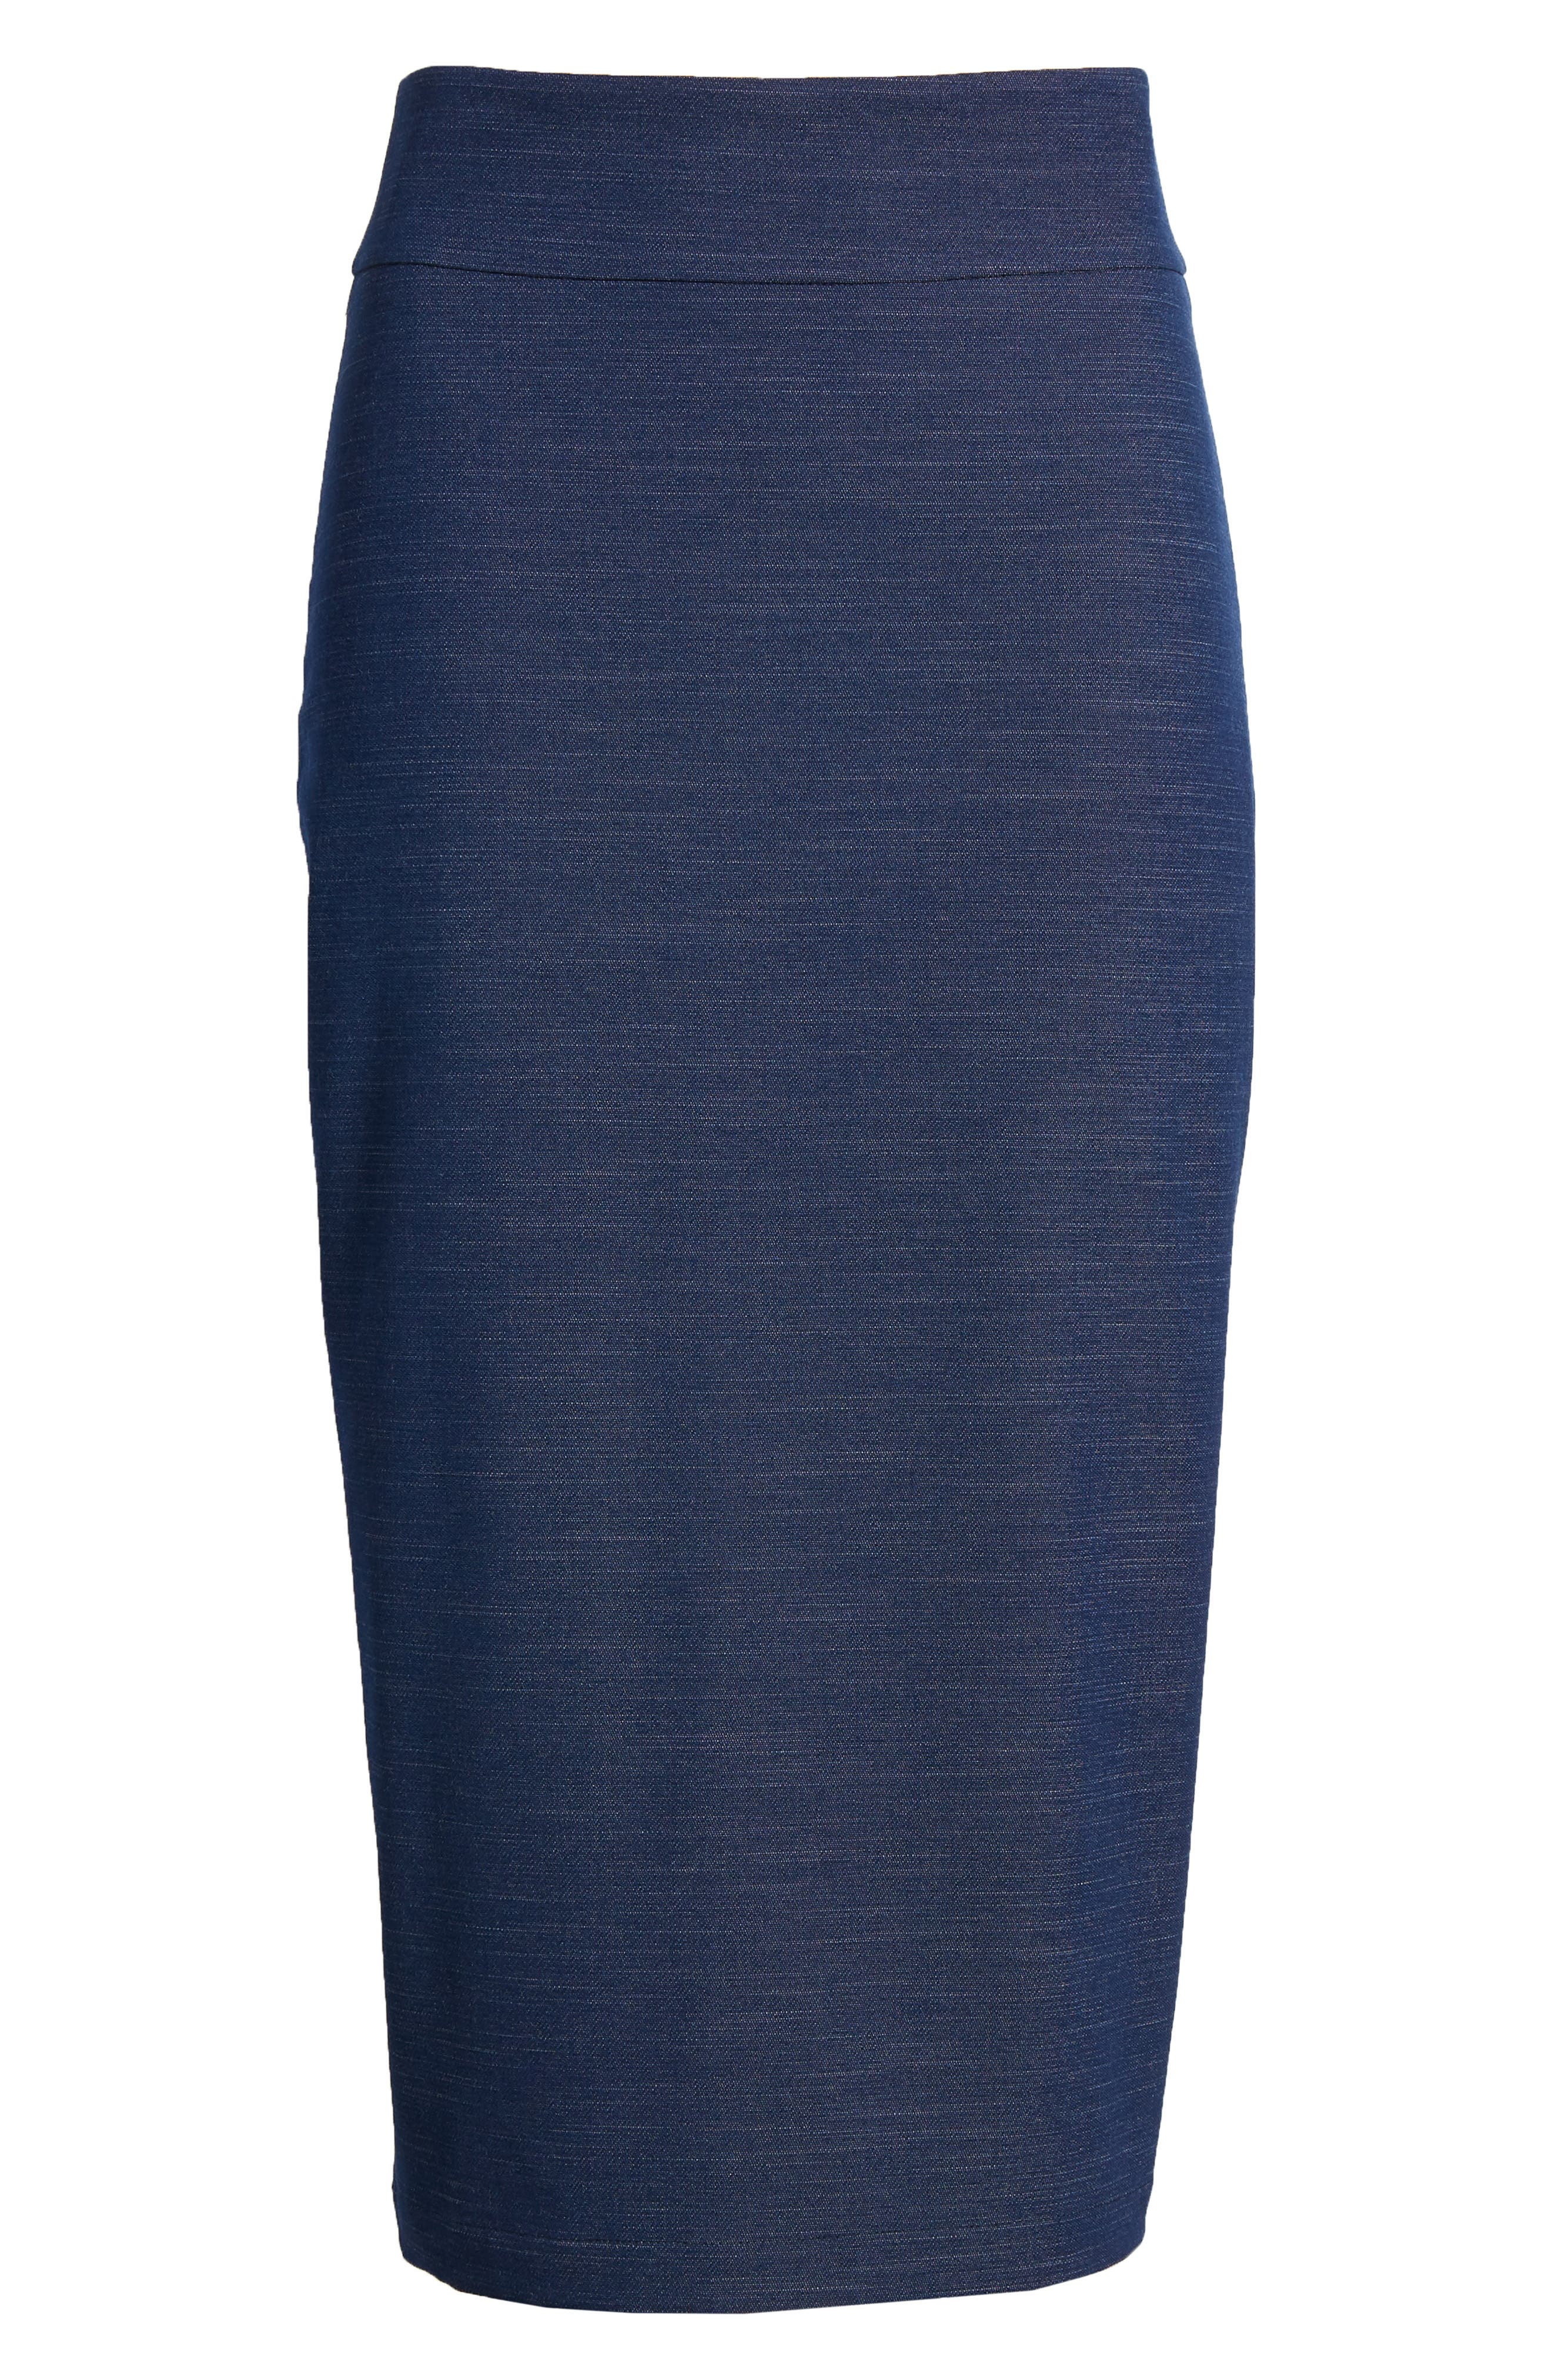 High Waist Chambray Skirt,                             Alternate thumbnail 6, color,                             Dark Chambray